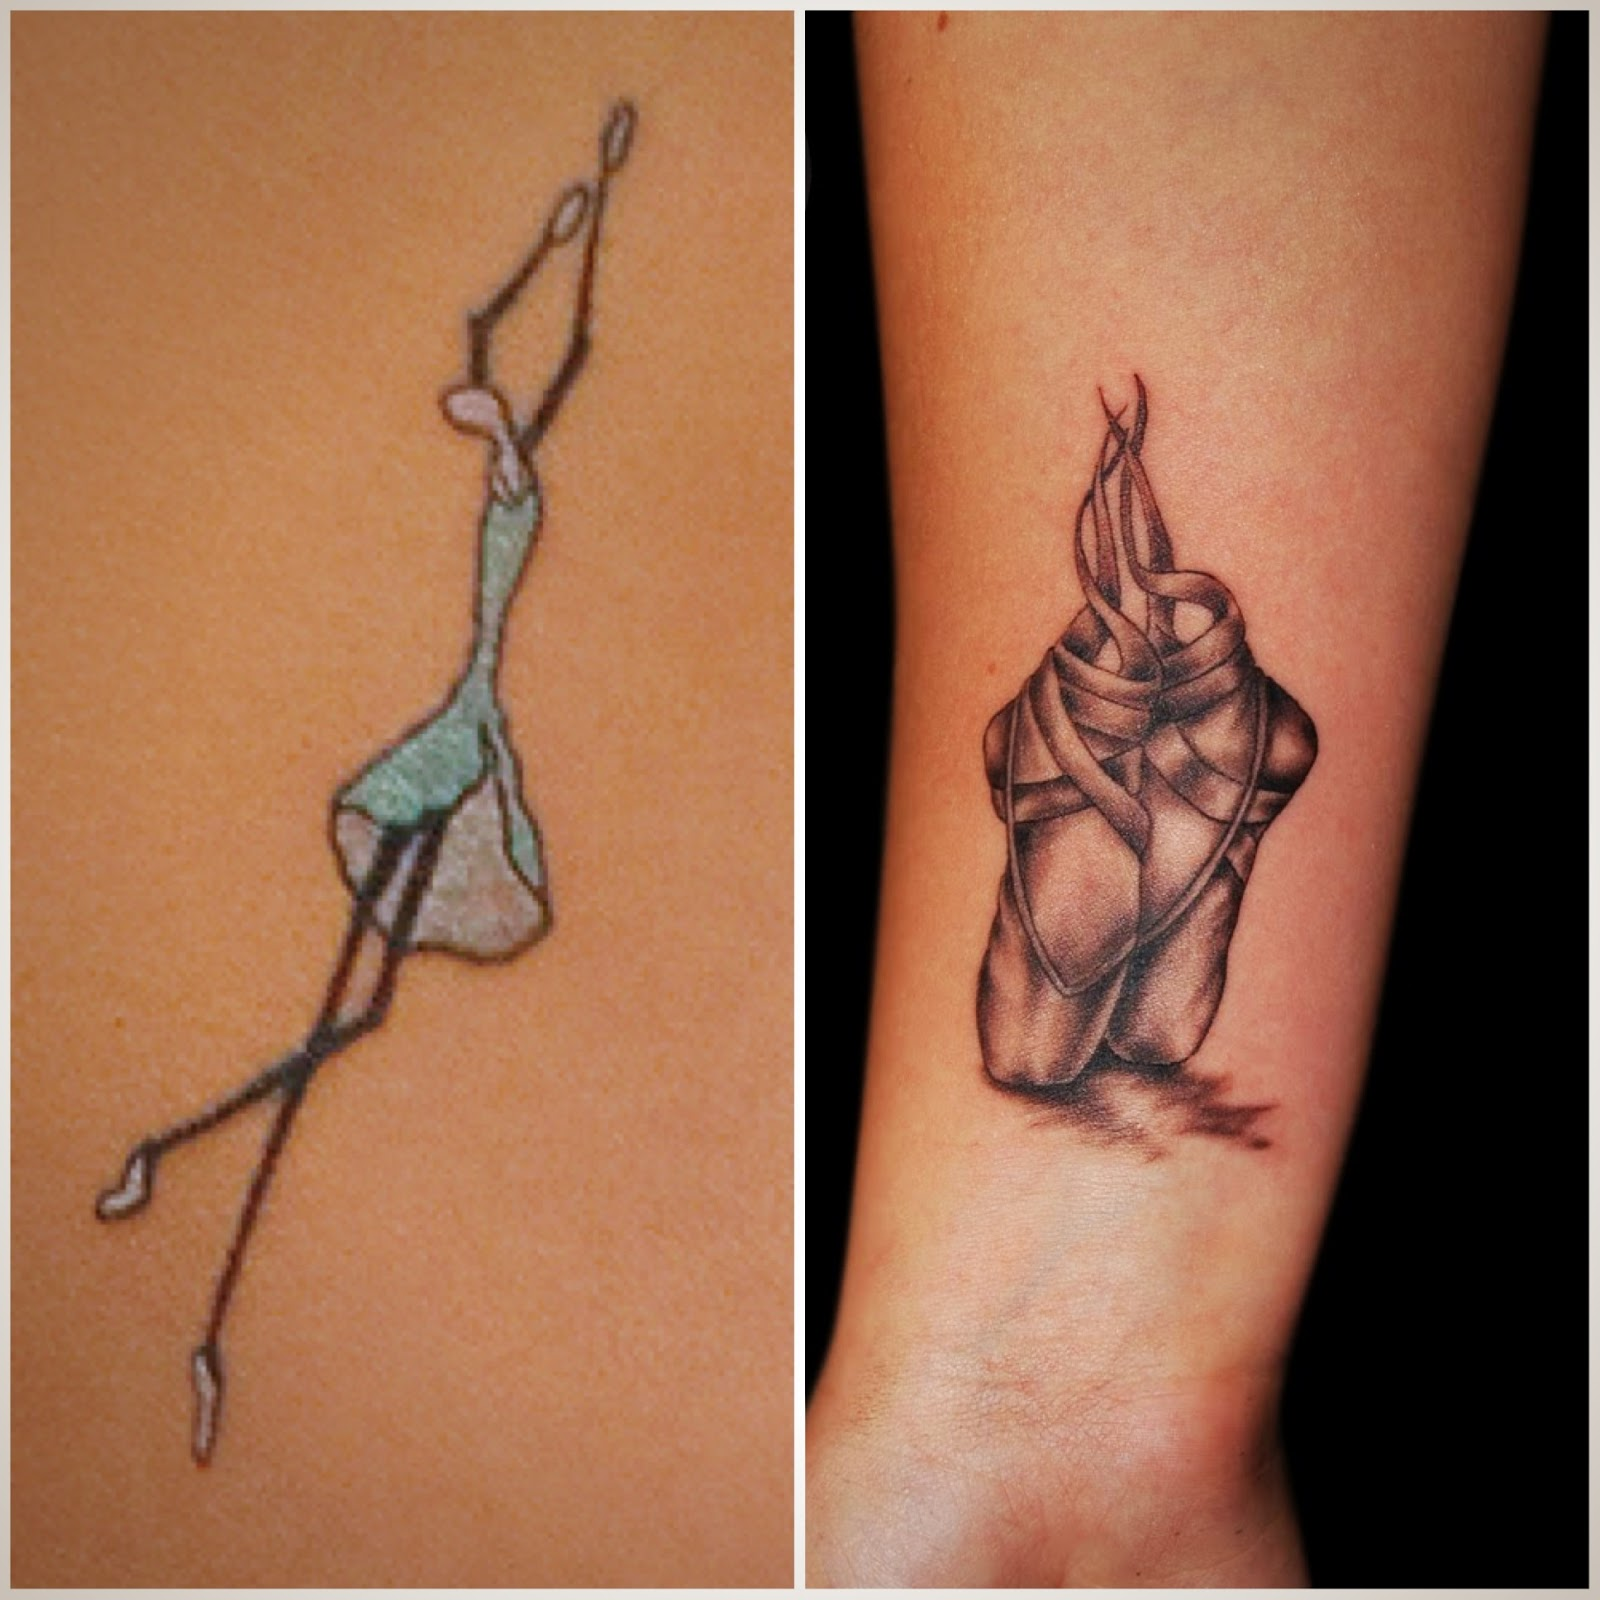 Tatuagens de Bailarina